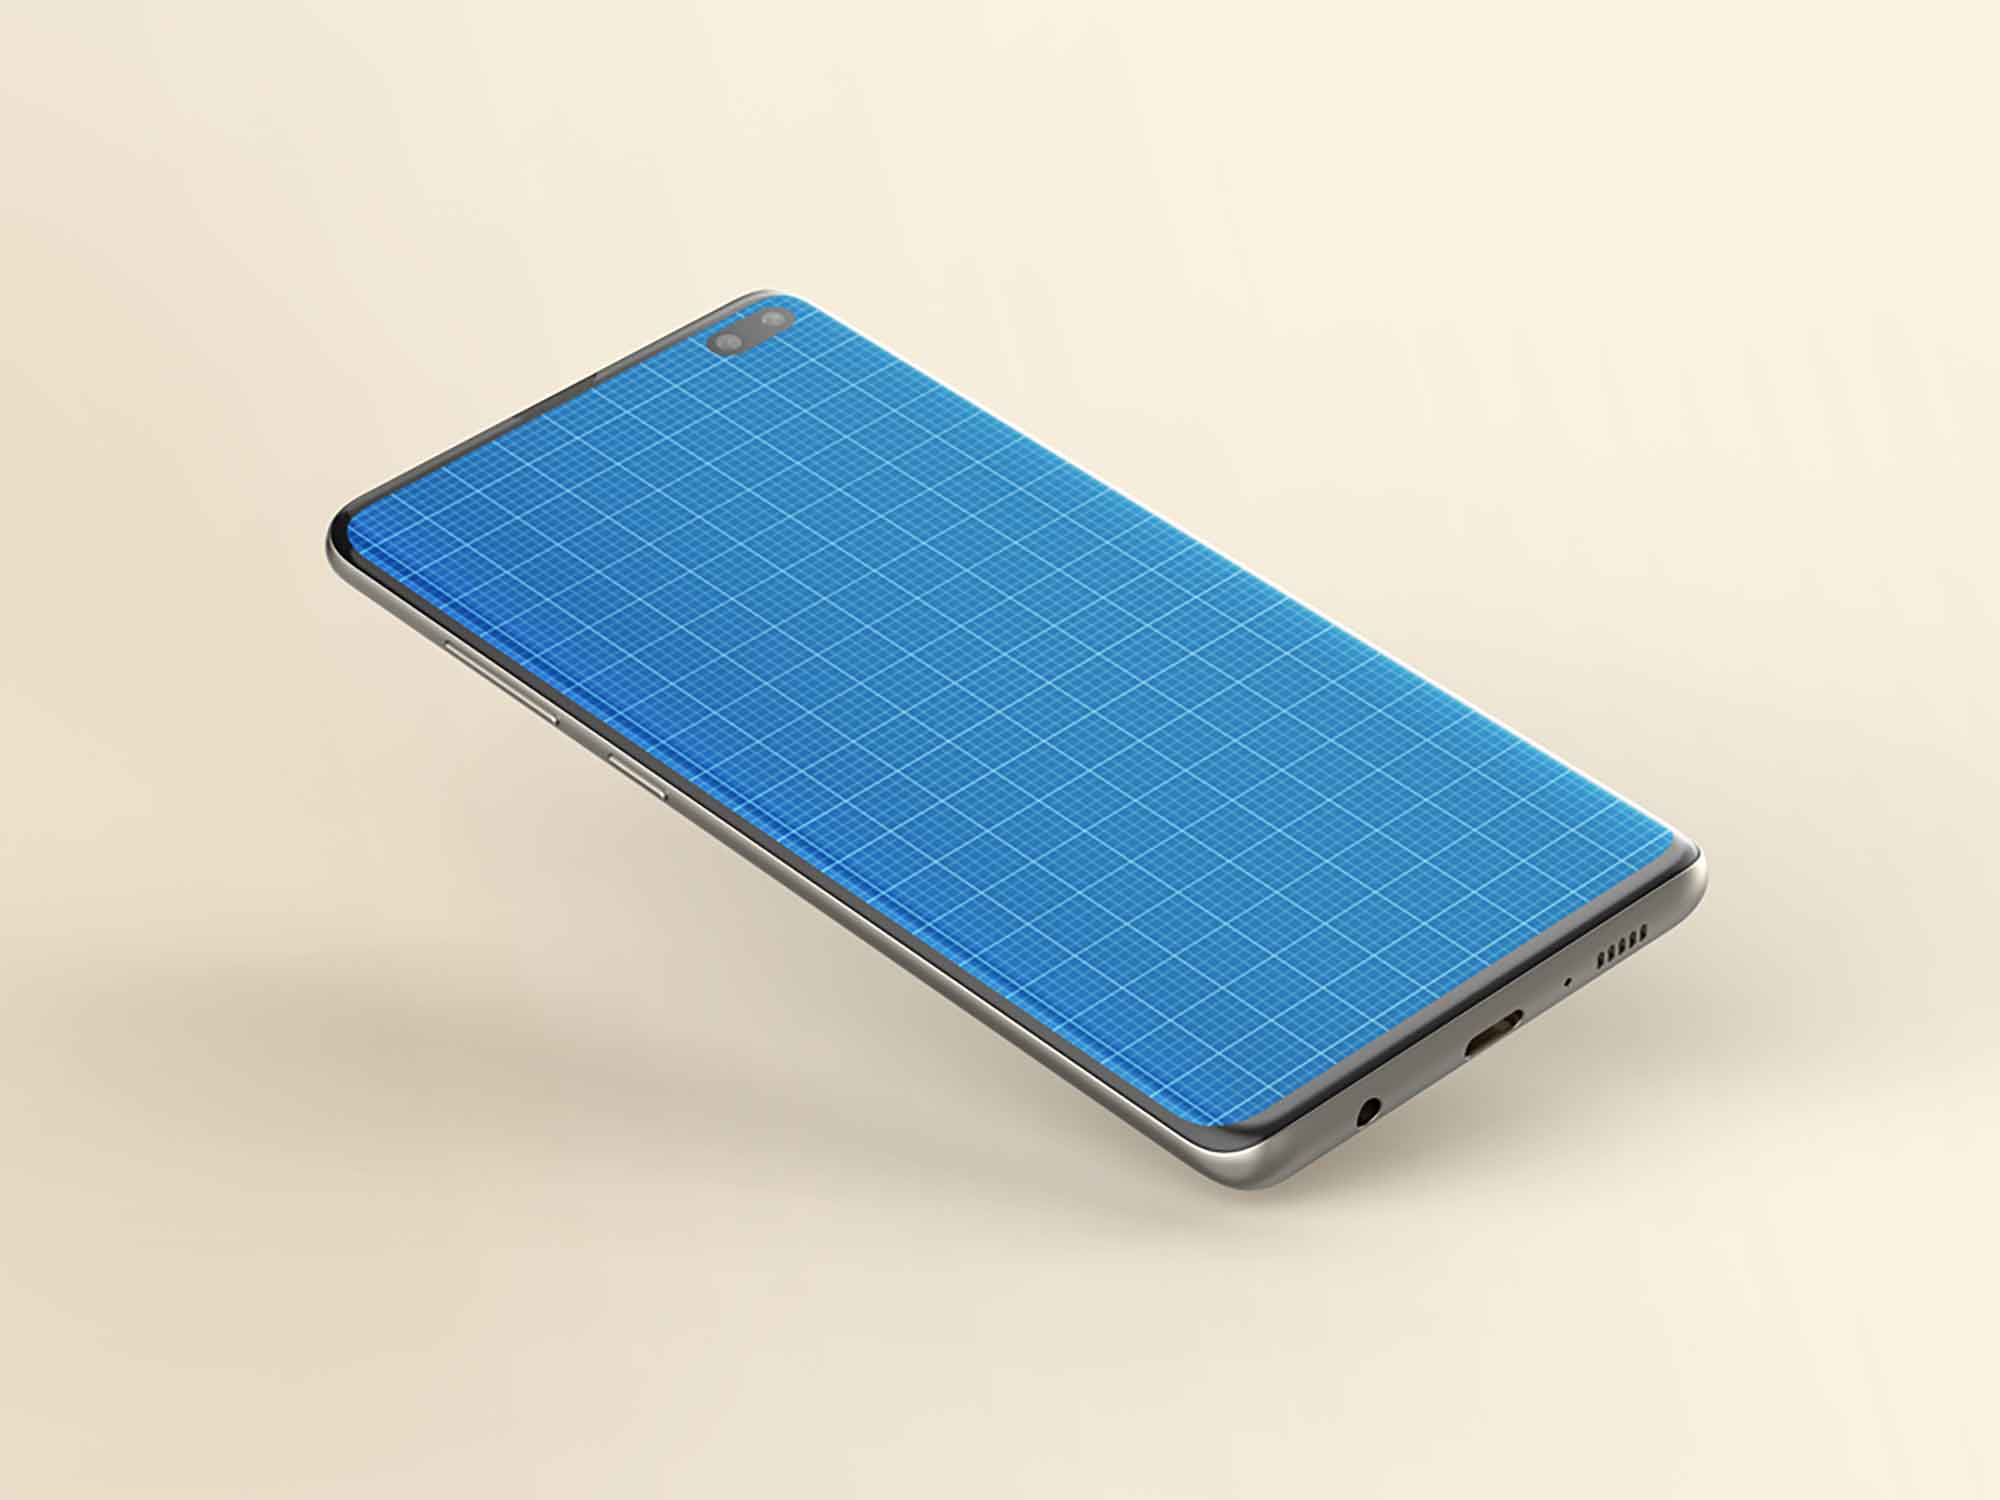 Samsung Galaxy S10+ Mockup 3